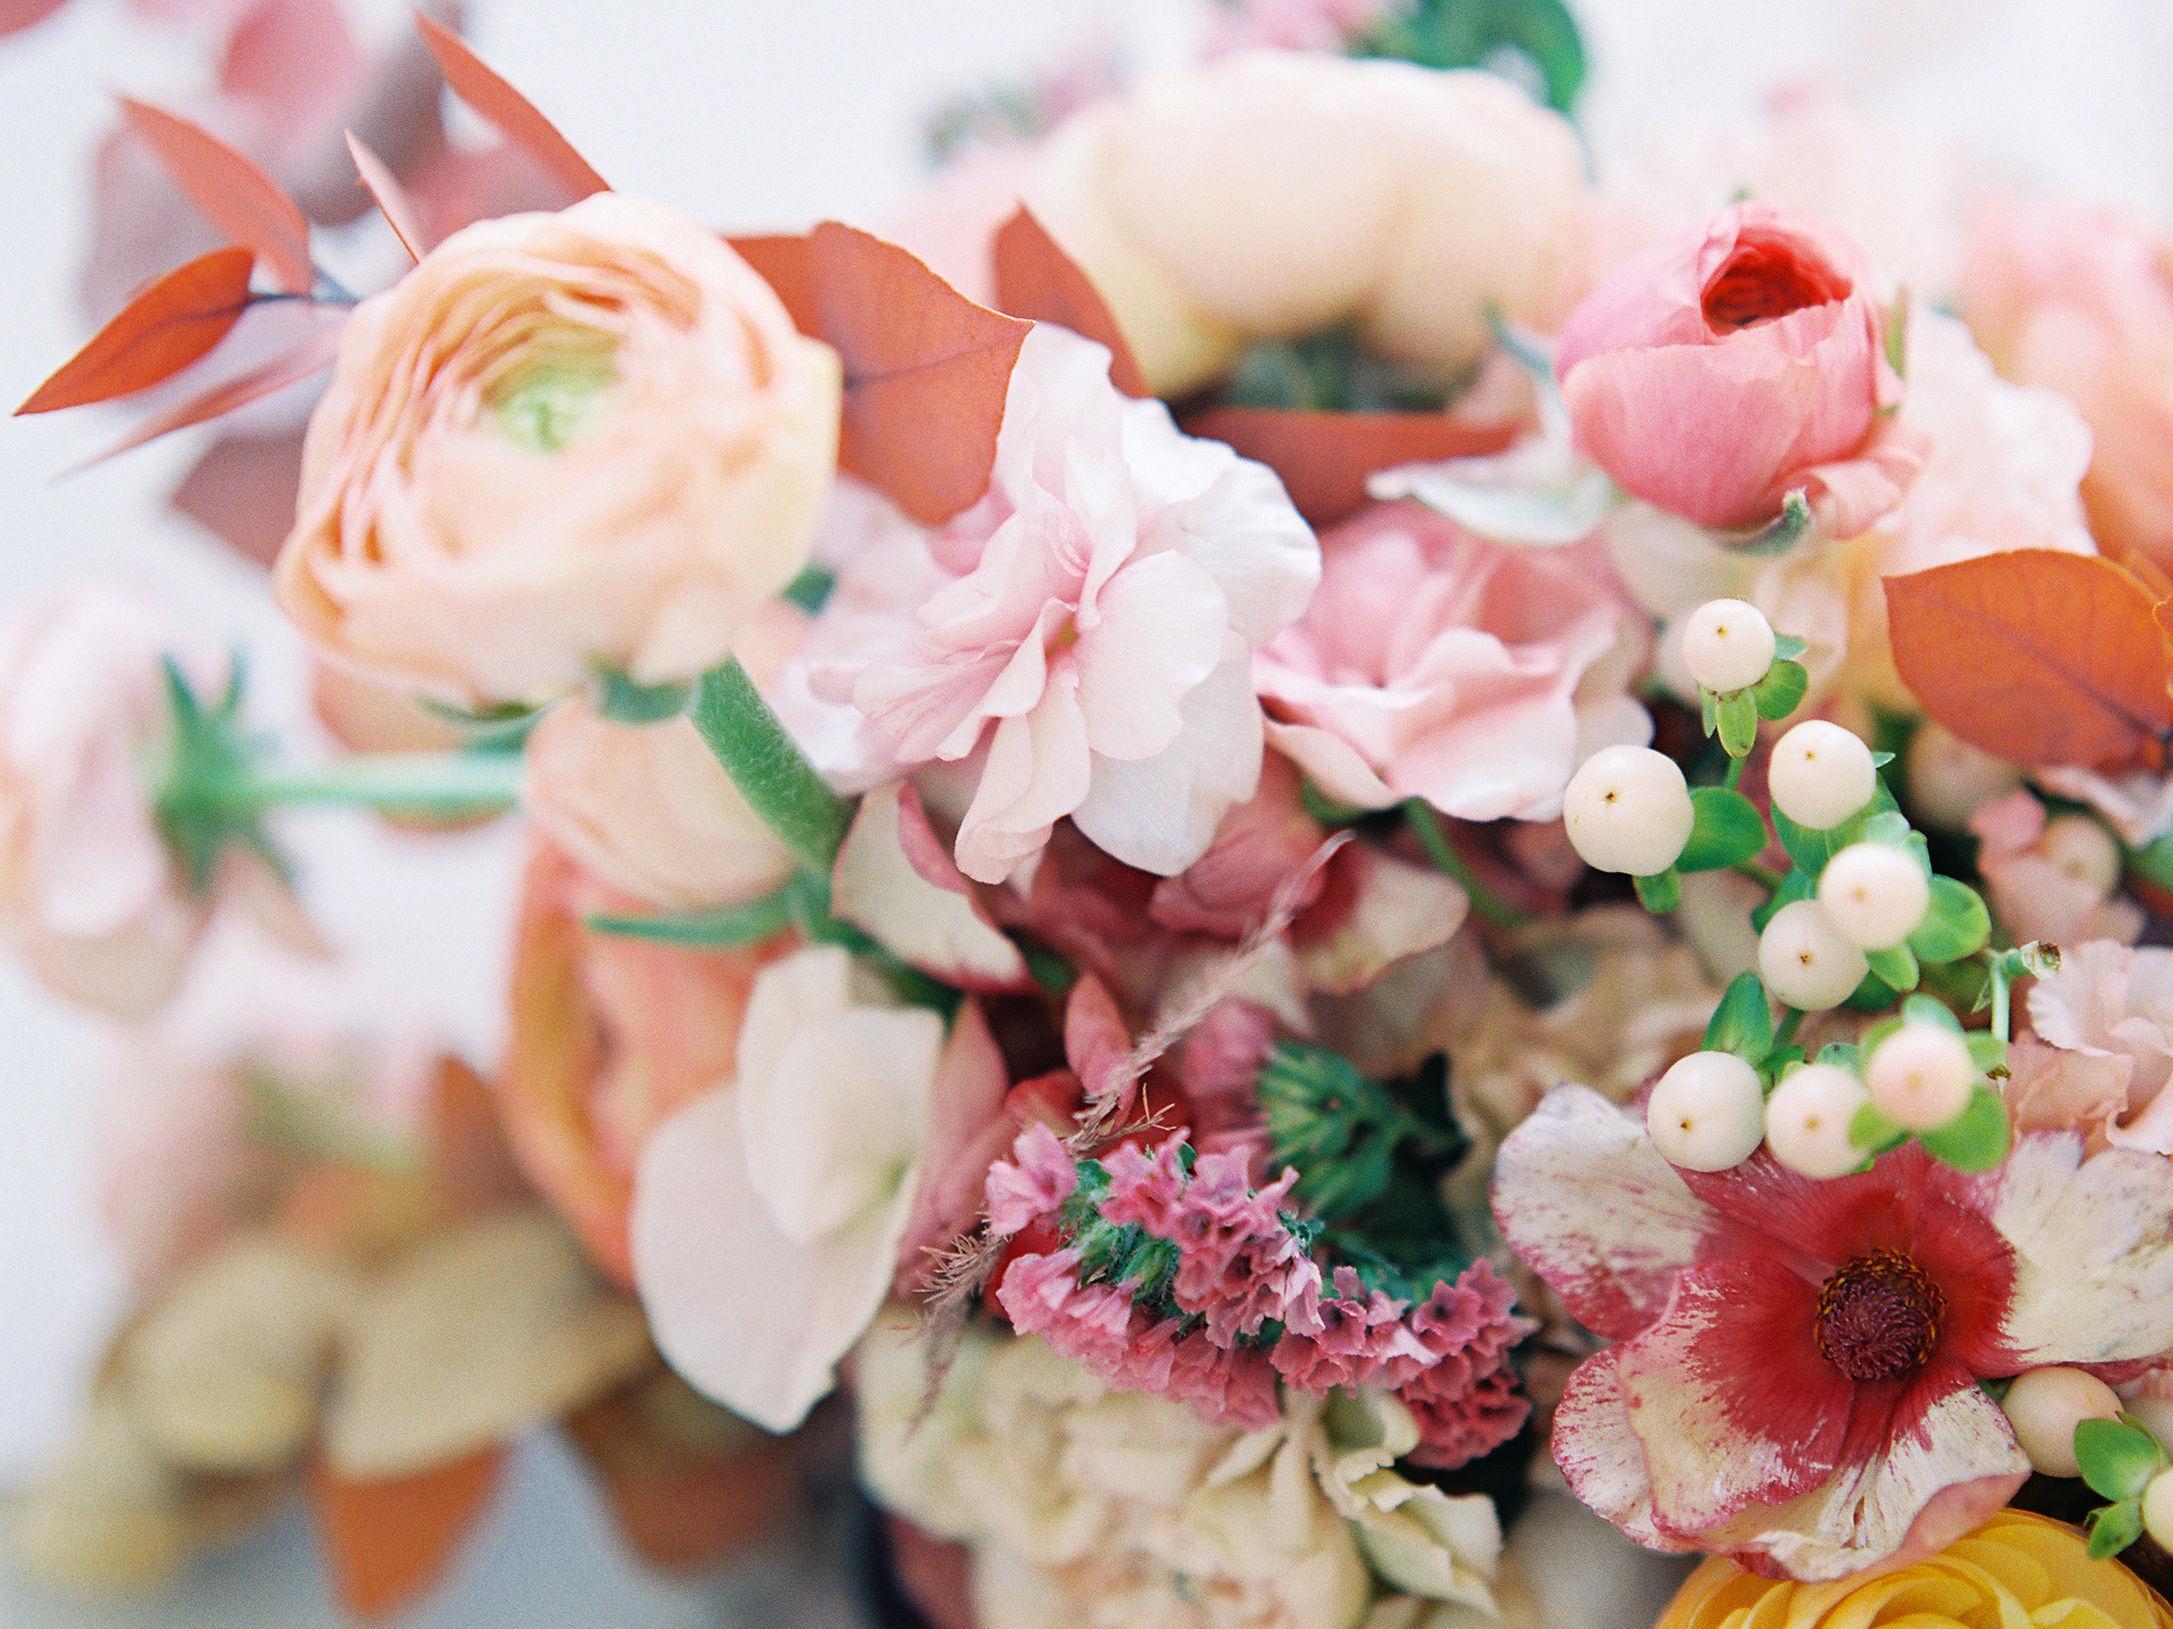 jessica-zimmerman-events-sunstone-bridal-bouquet.jpg